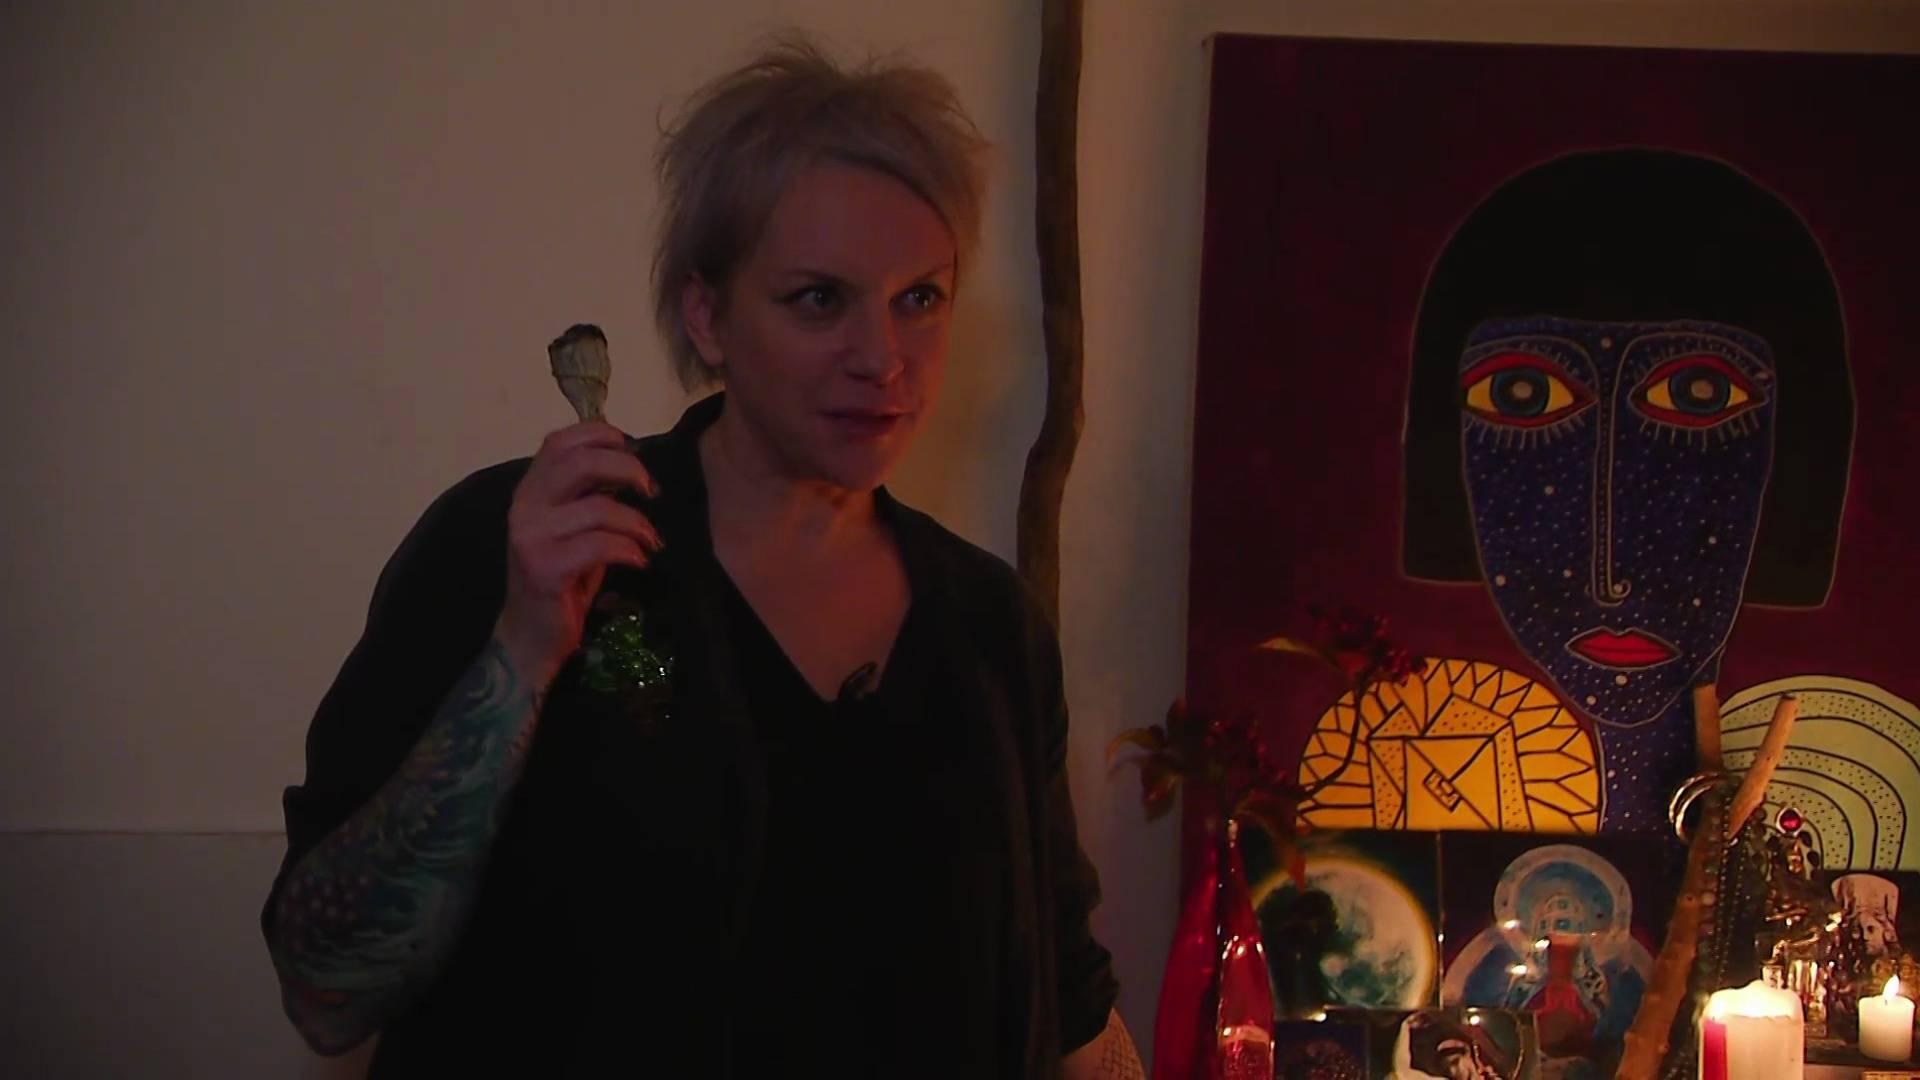 Ирина маклакова деревенская ведьма на 18-й битве